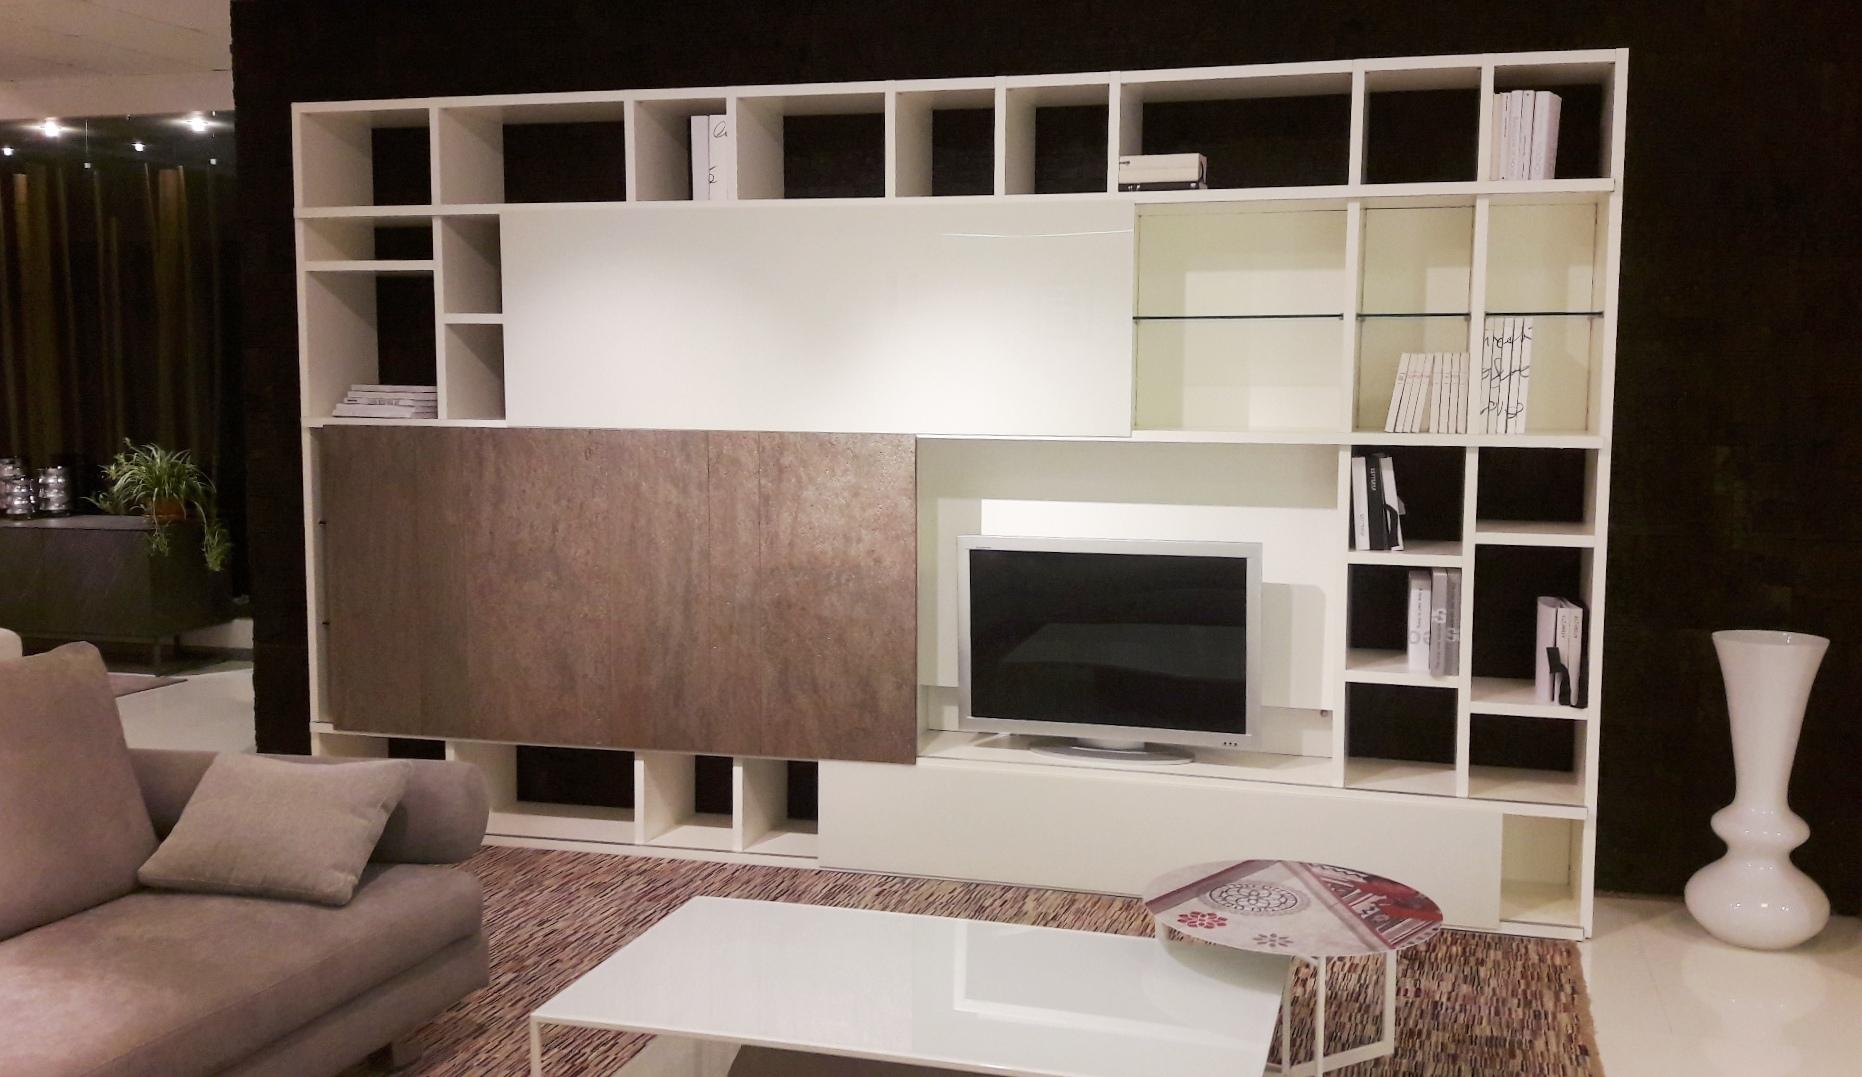 Best Presotto Soggiorno Pictures - Modern Home Design - orangetech.us